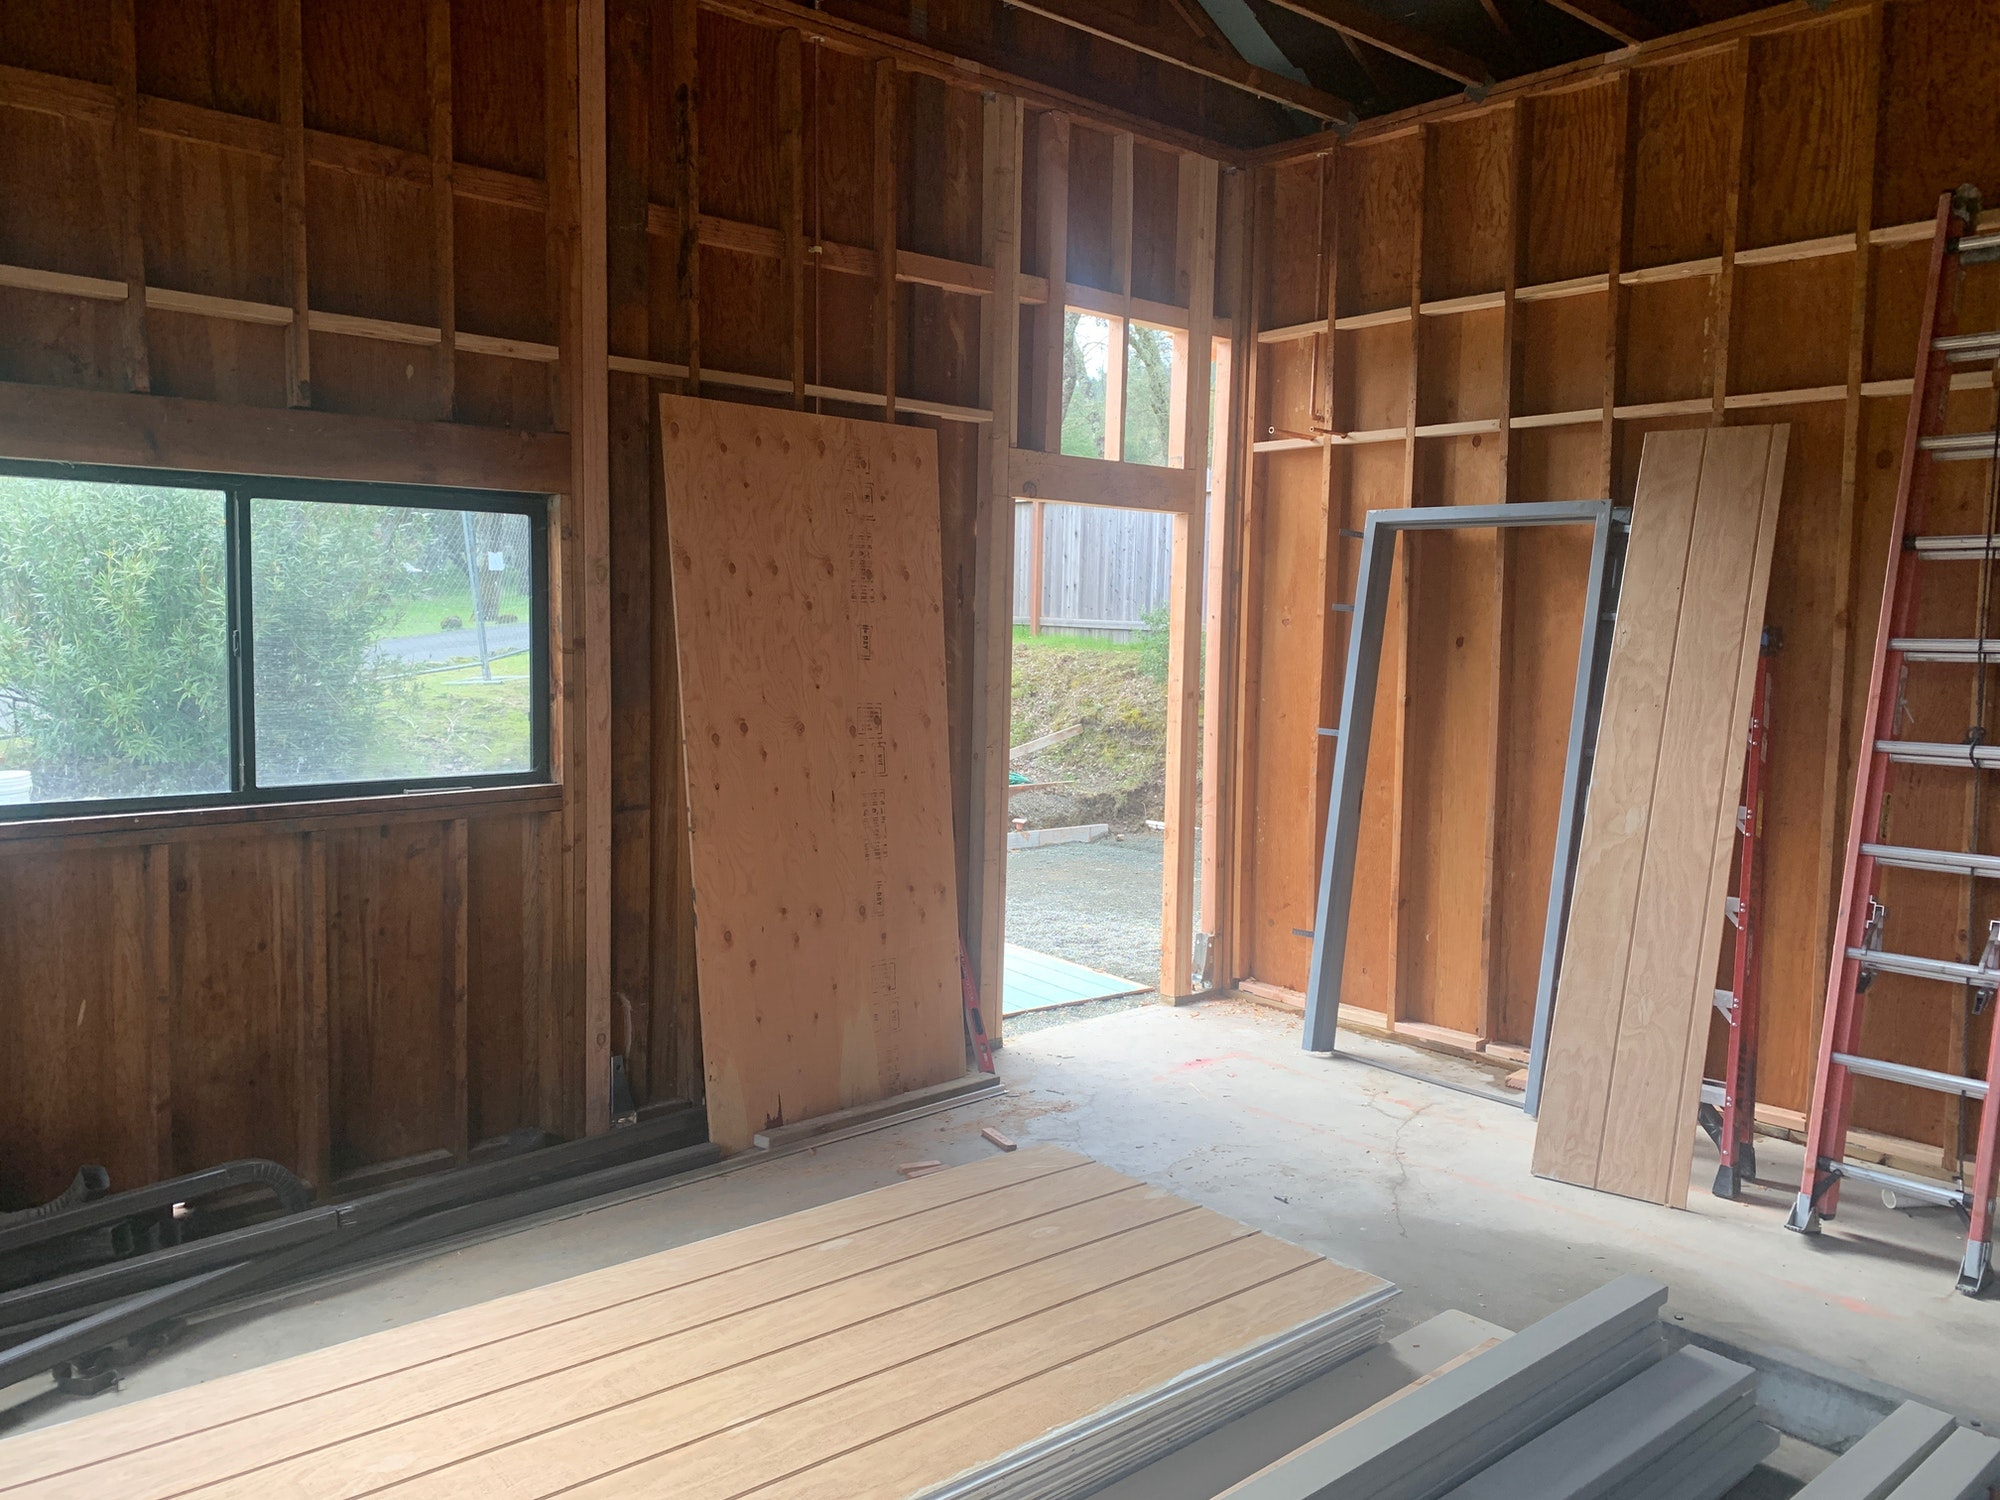 May contain: flooring, wood, floor, hardwood, and plywood